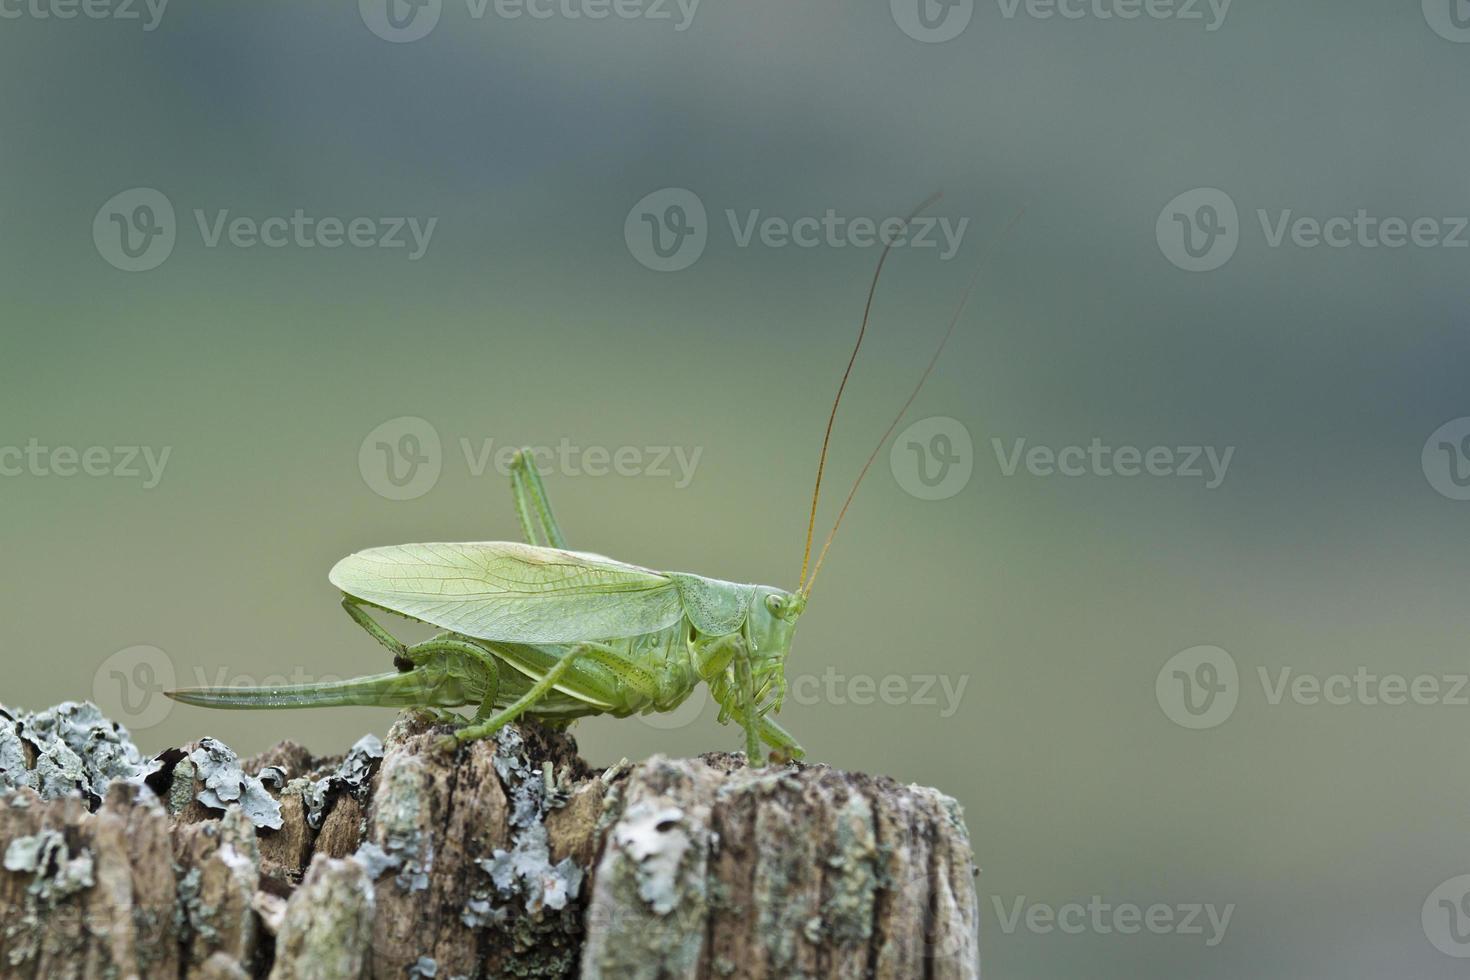 Gran especie de arbusto verde de cricket tettigonia viridissima, francia foto